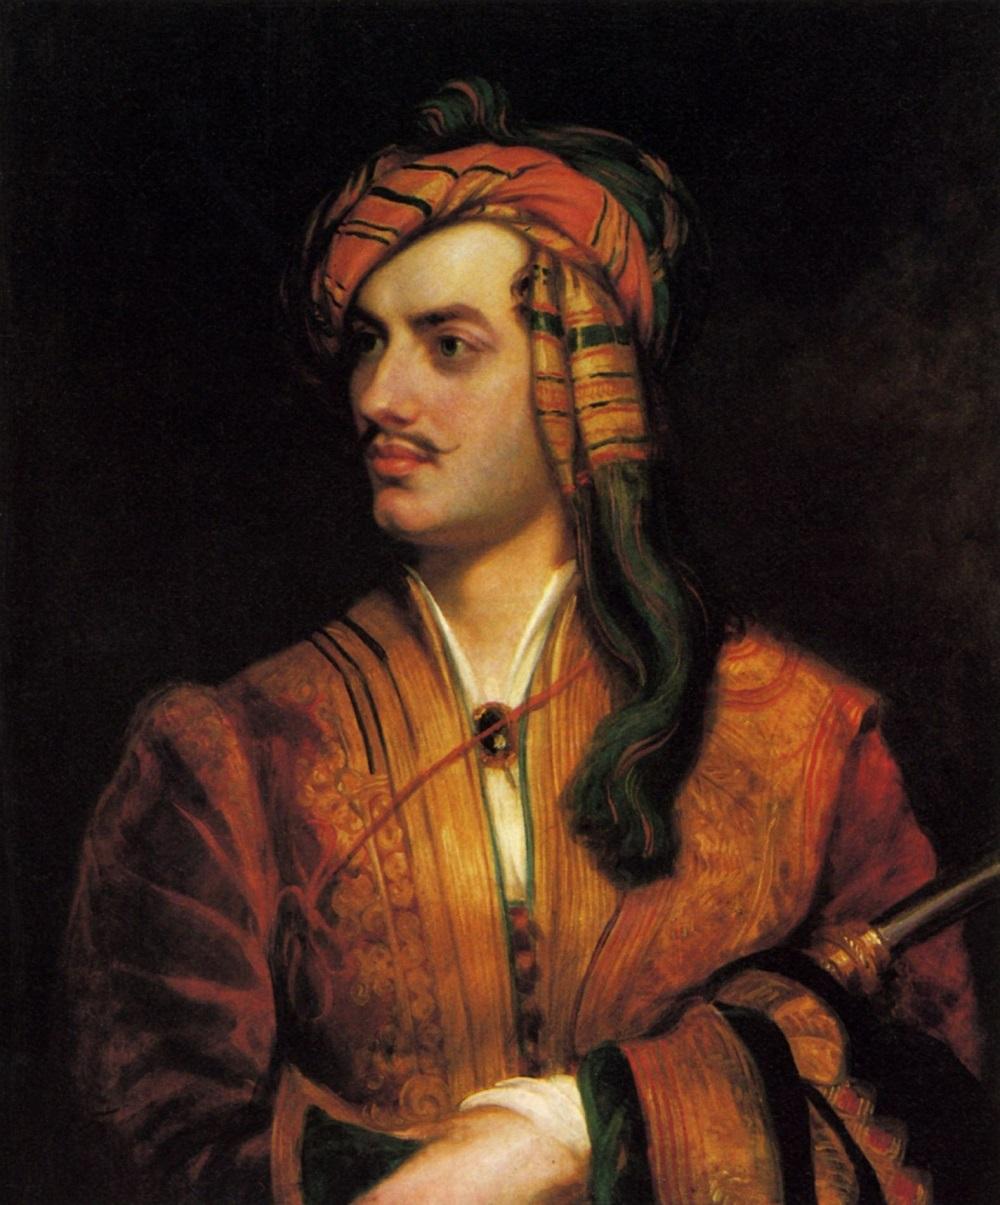 00 George Gordon Byron (1788-1824), 6th Baron Byron, Poet By Thomas Phillips.jpg